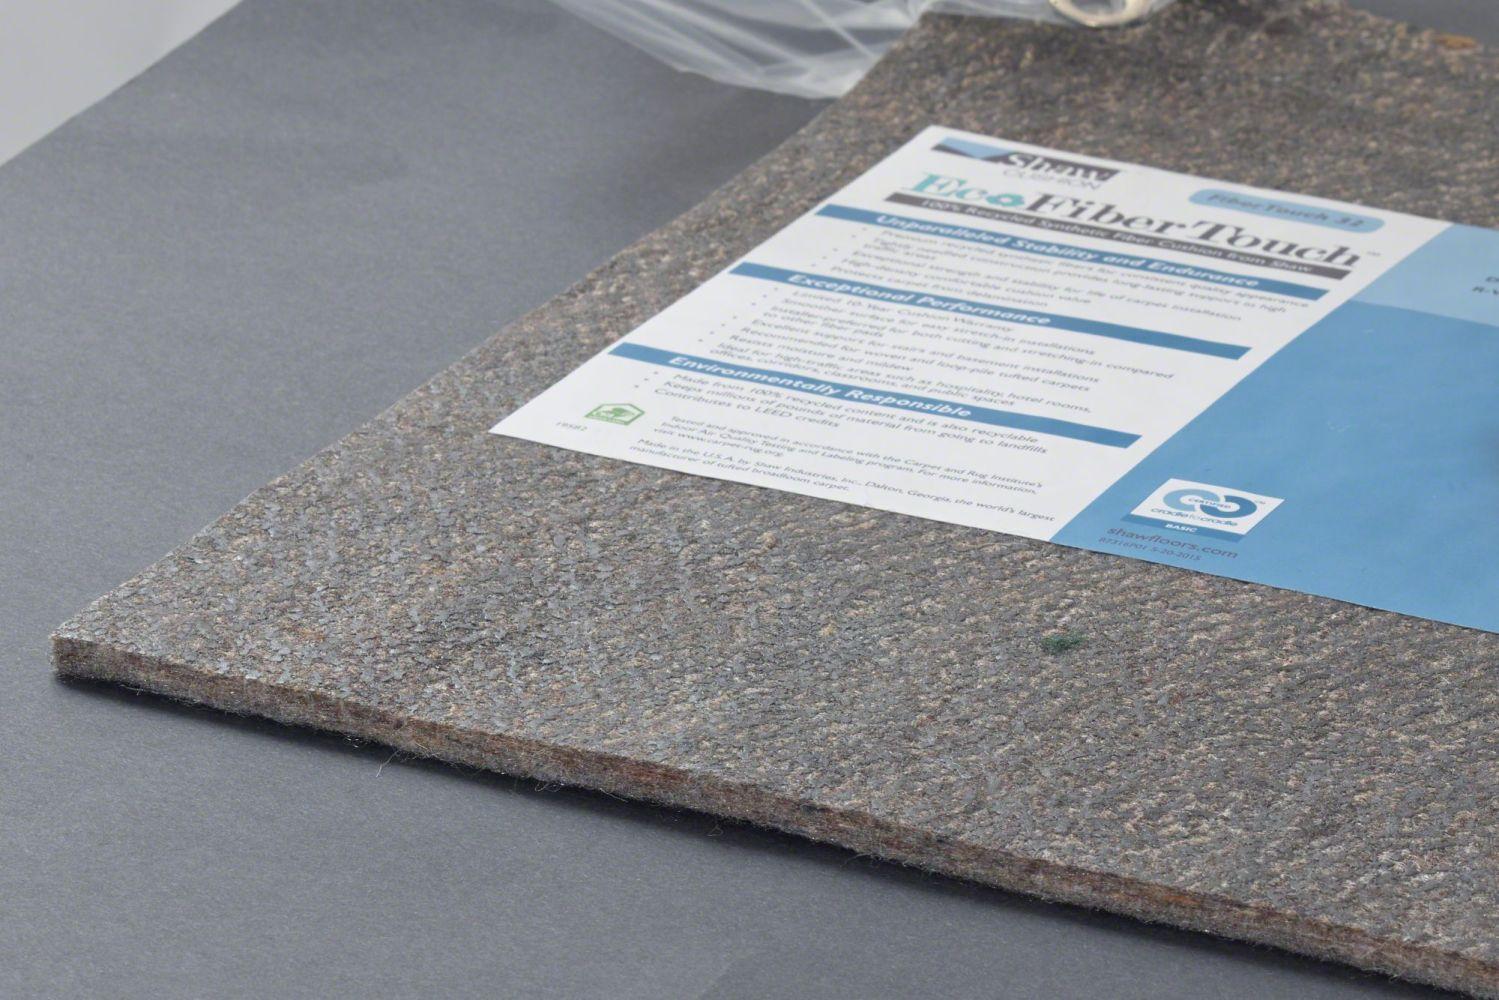 Shaw Floors Eco Edge Cushion Div3fibert32-6 Grey 00001_512PD